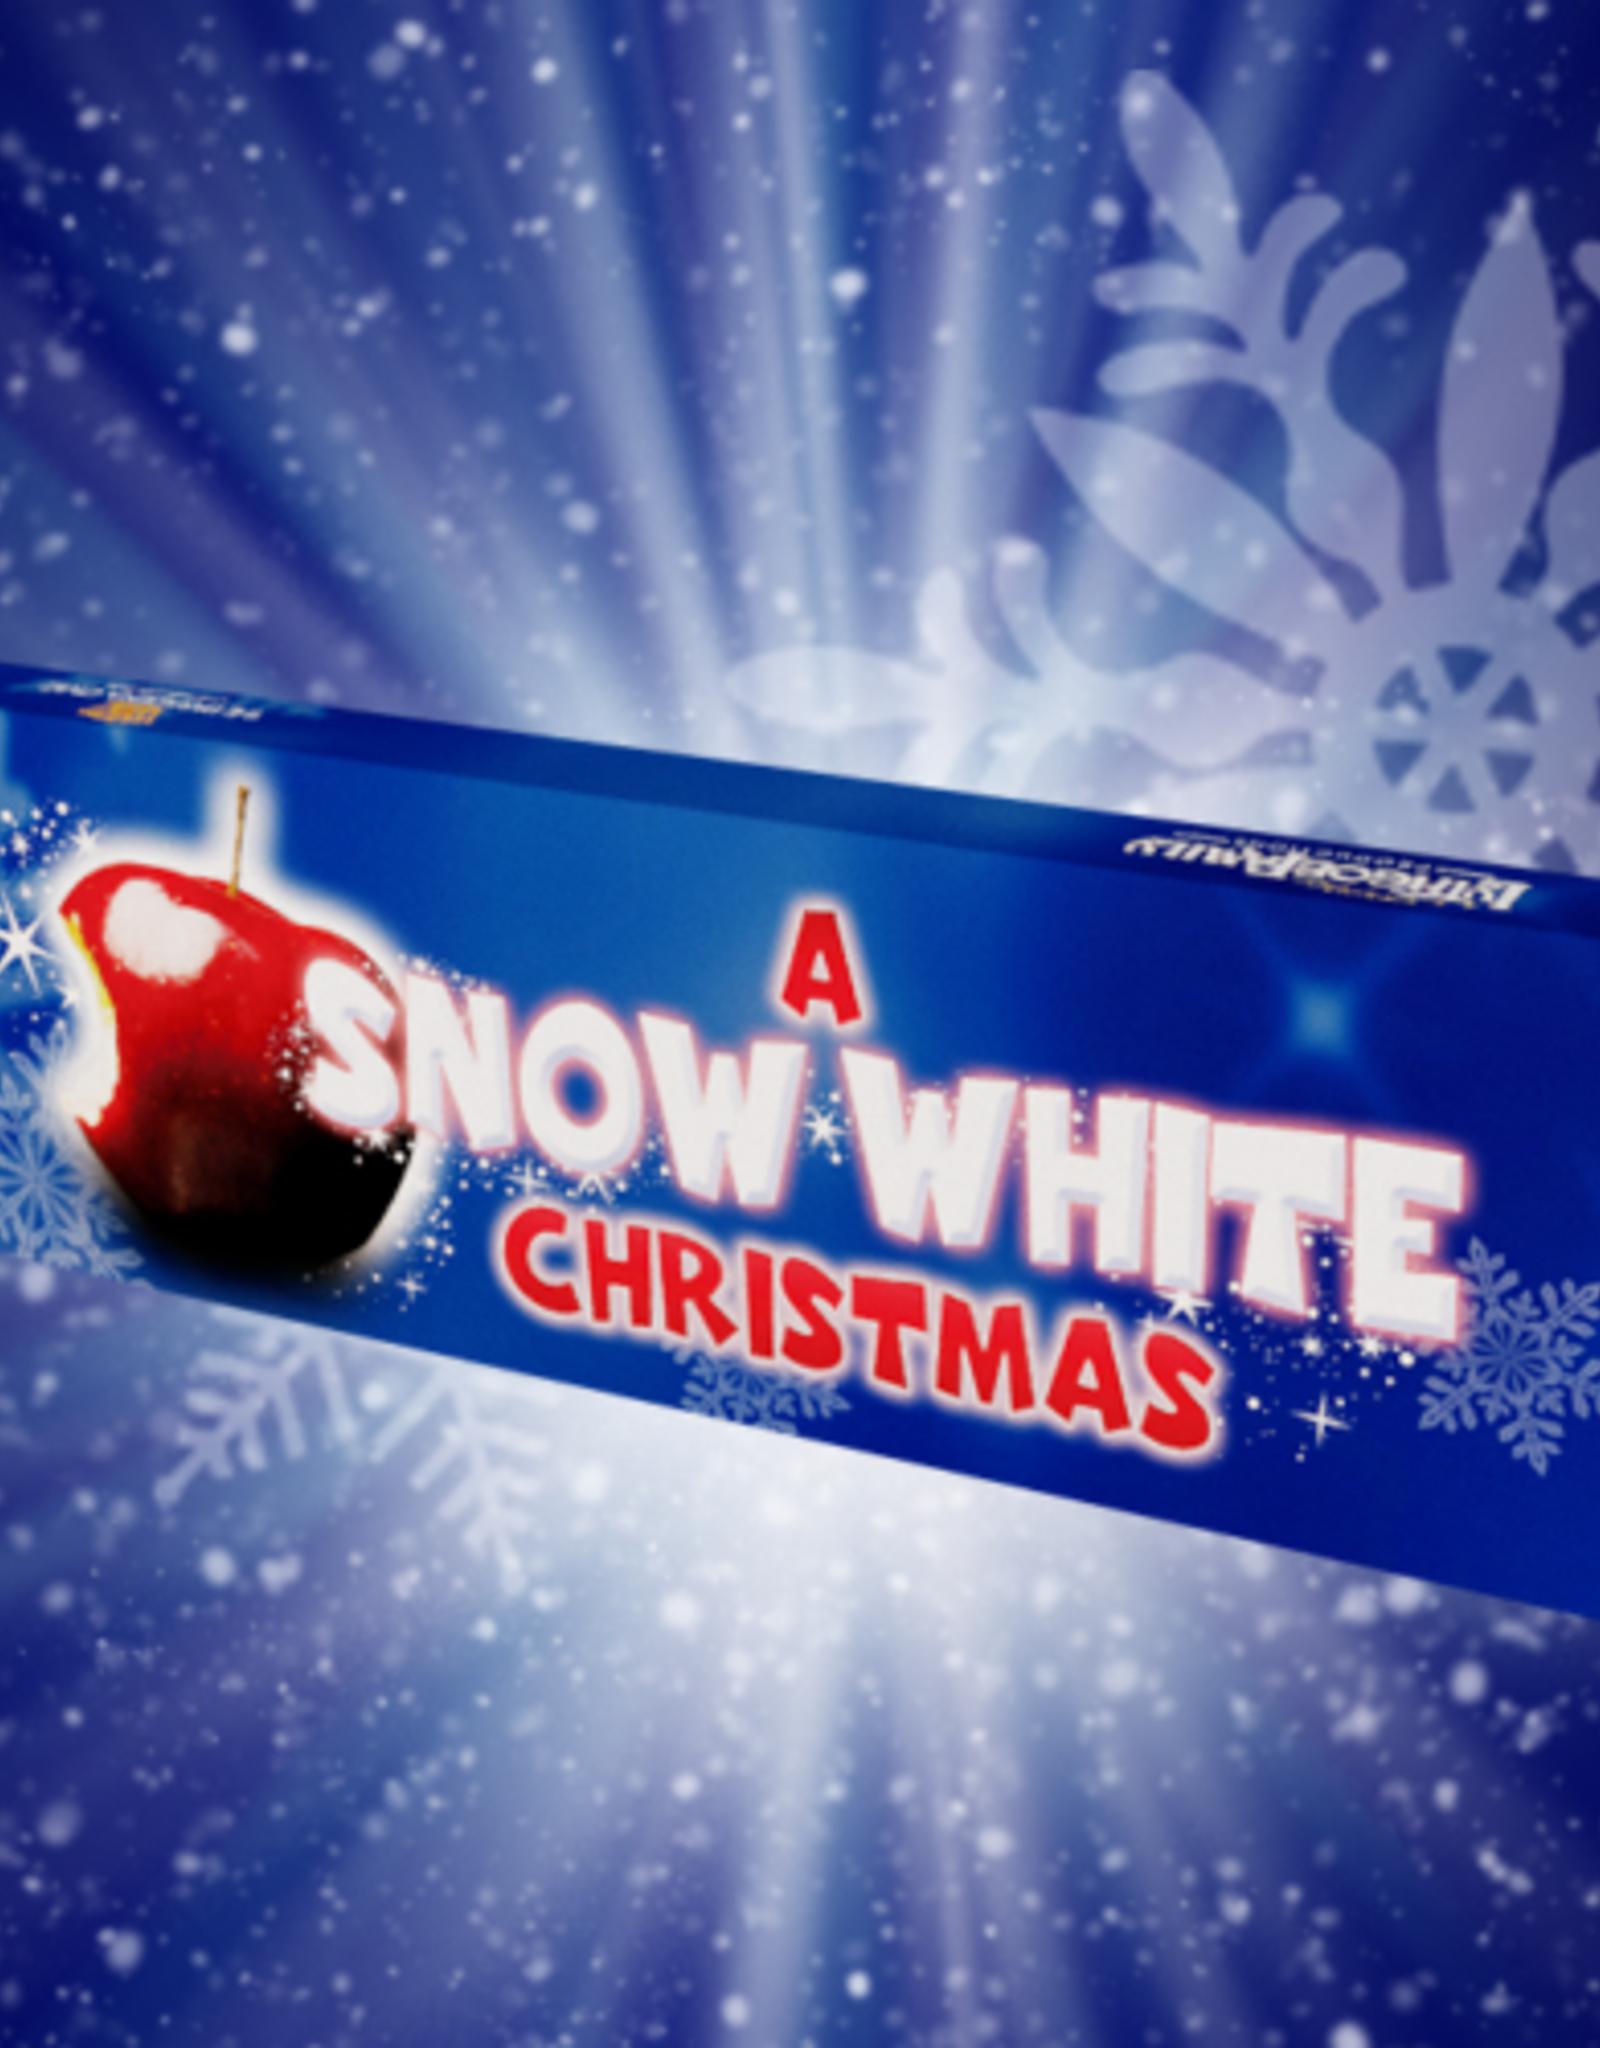 A Snow White Christmas Chocolate Bar